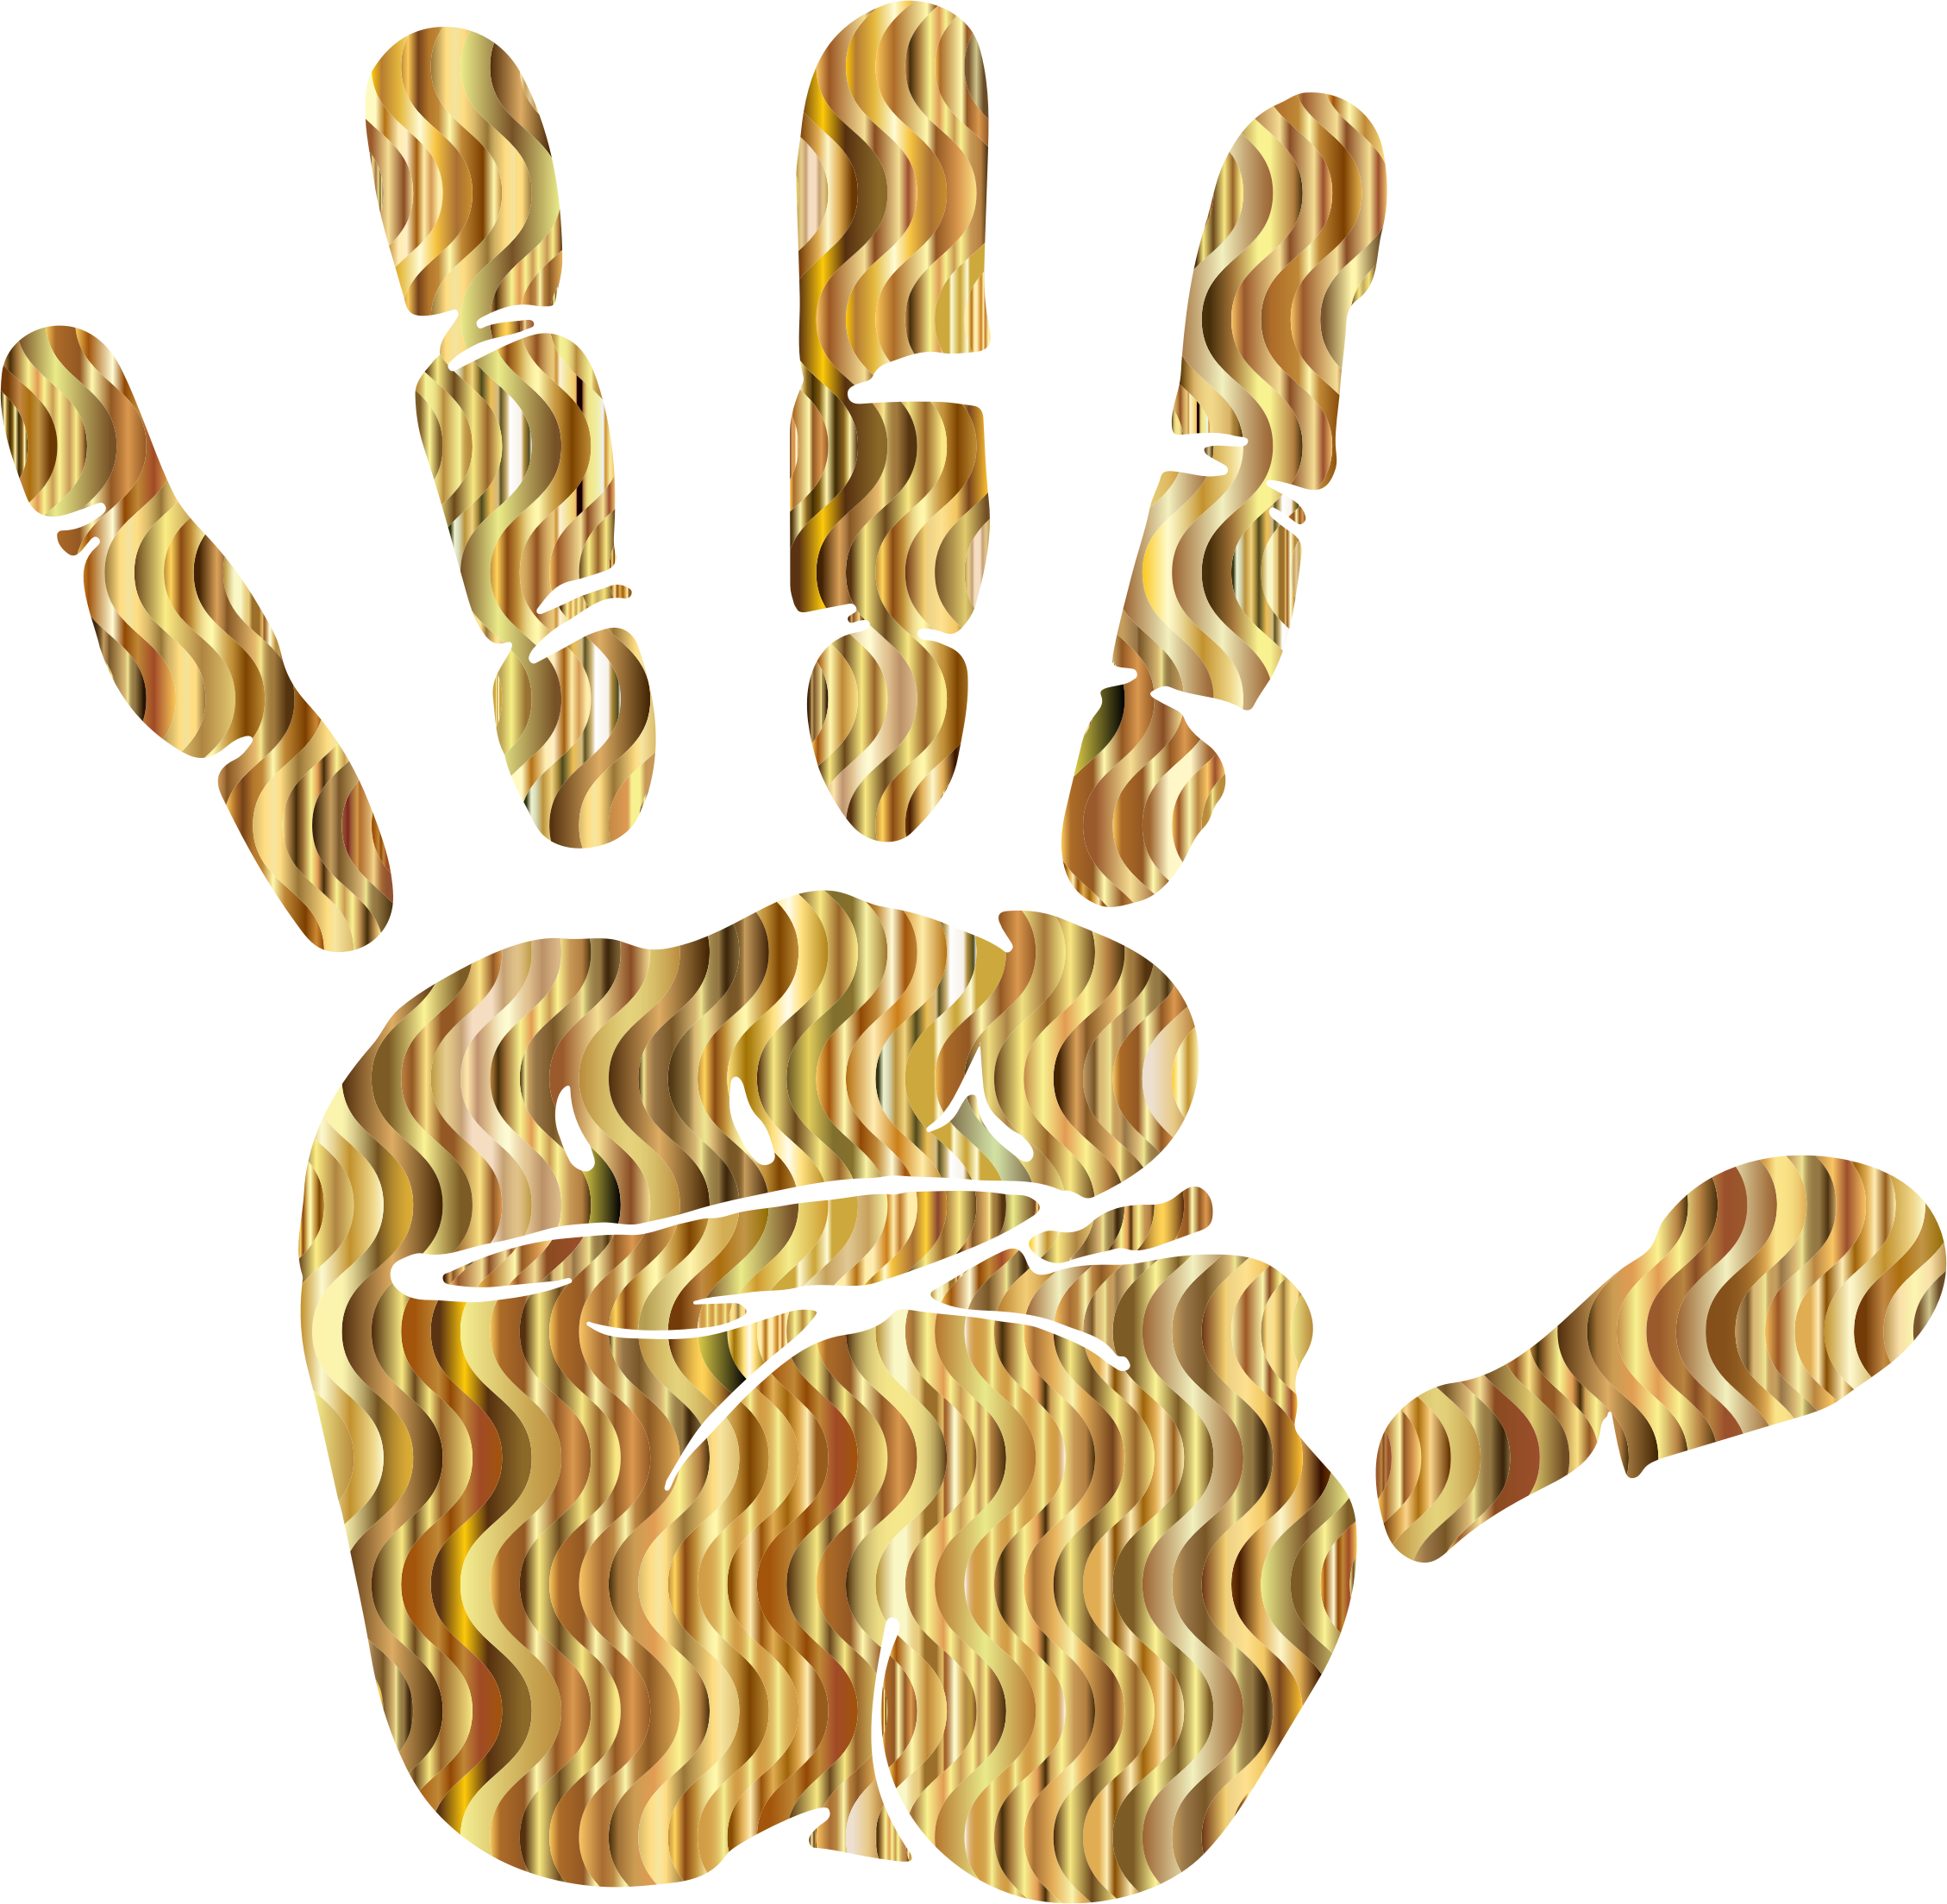 2258x2208 Prismatic Design Handprint Vector Graphics Image